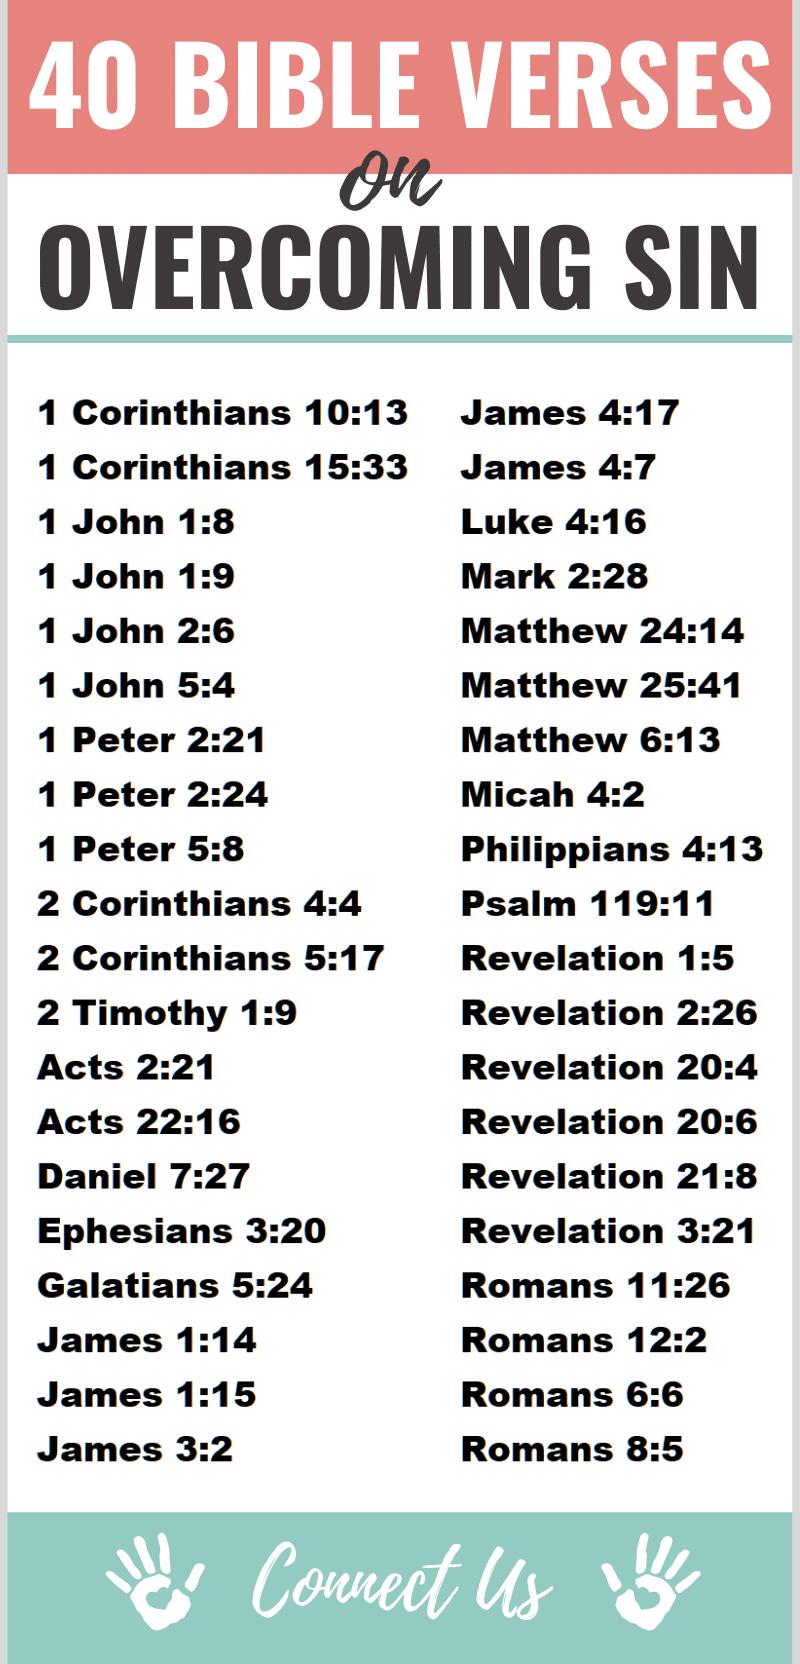 Bible Verses on Overcoming Sin